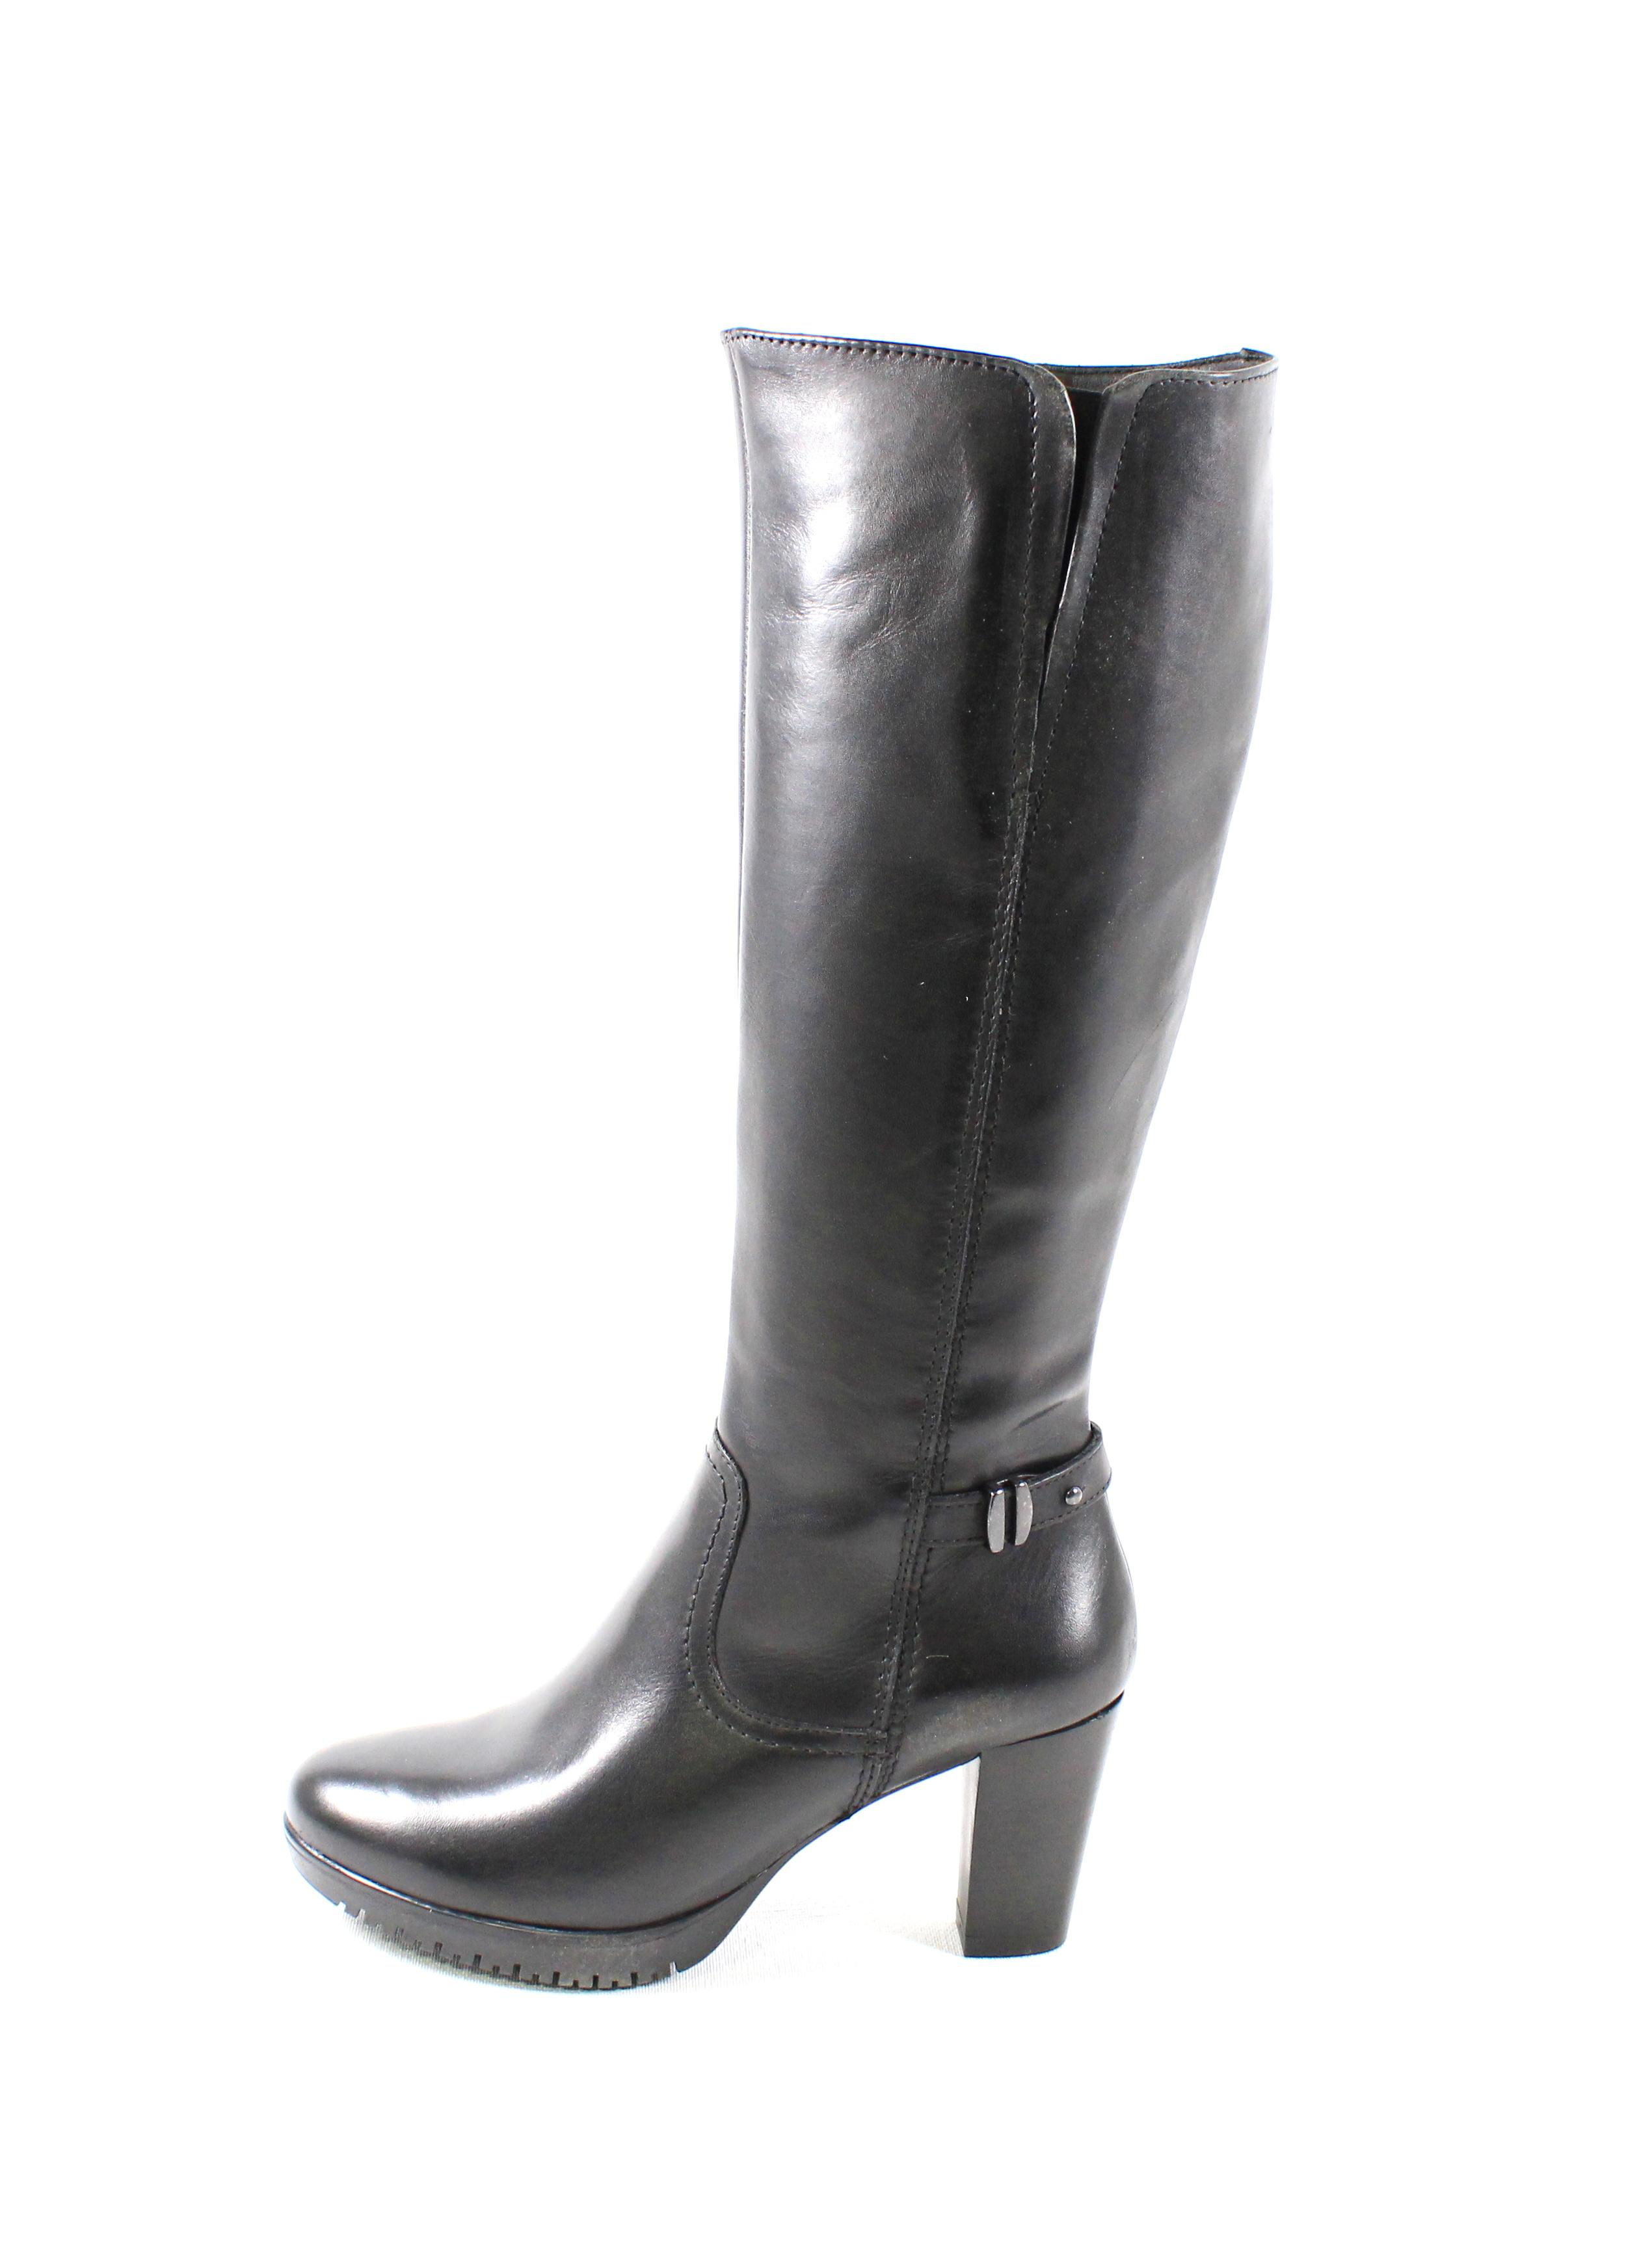 Dámske čižmy TAMARIS 1-2530-21 BLACK – Topánky Olympia shoes d56e7c5e1ce